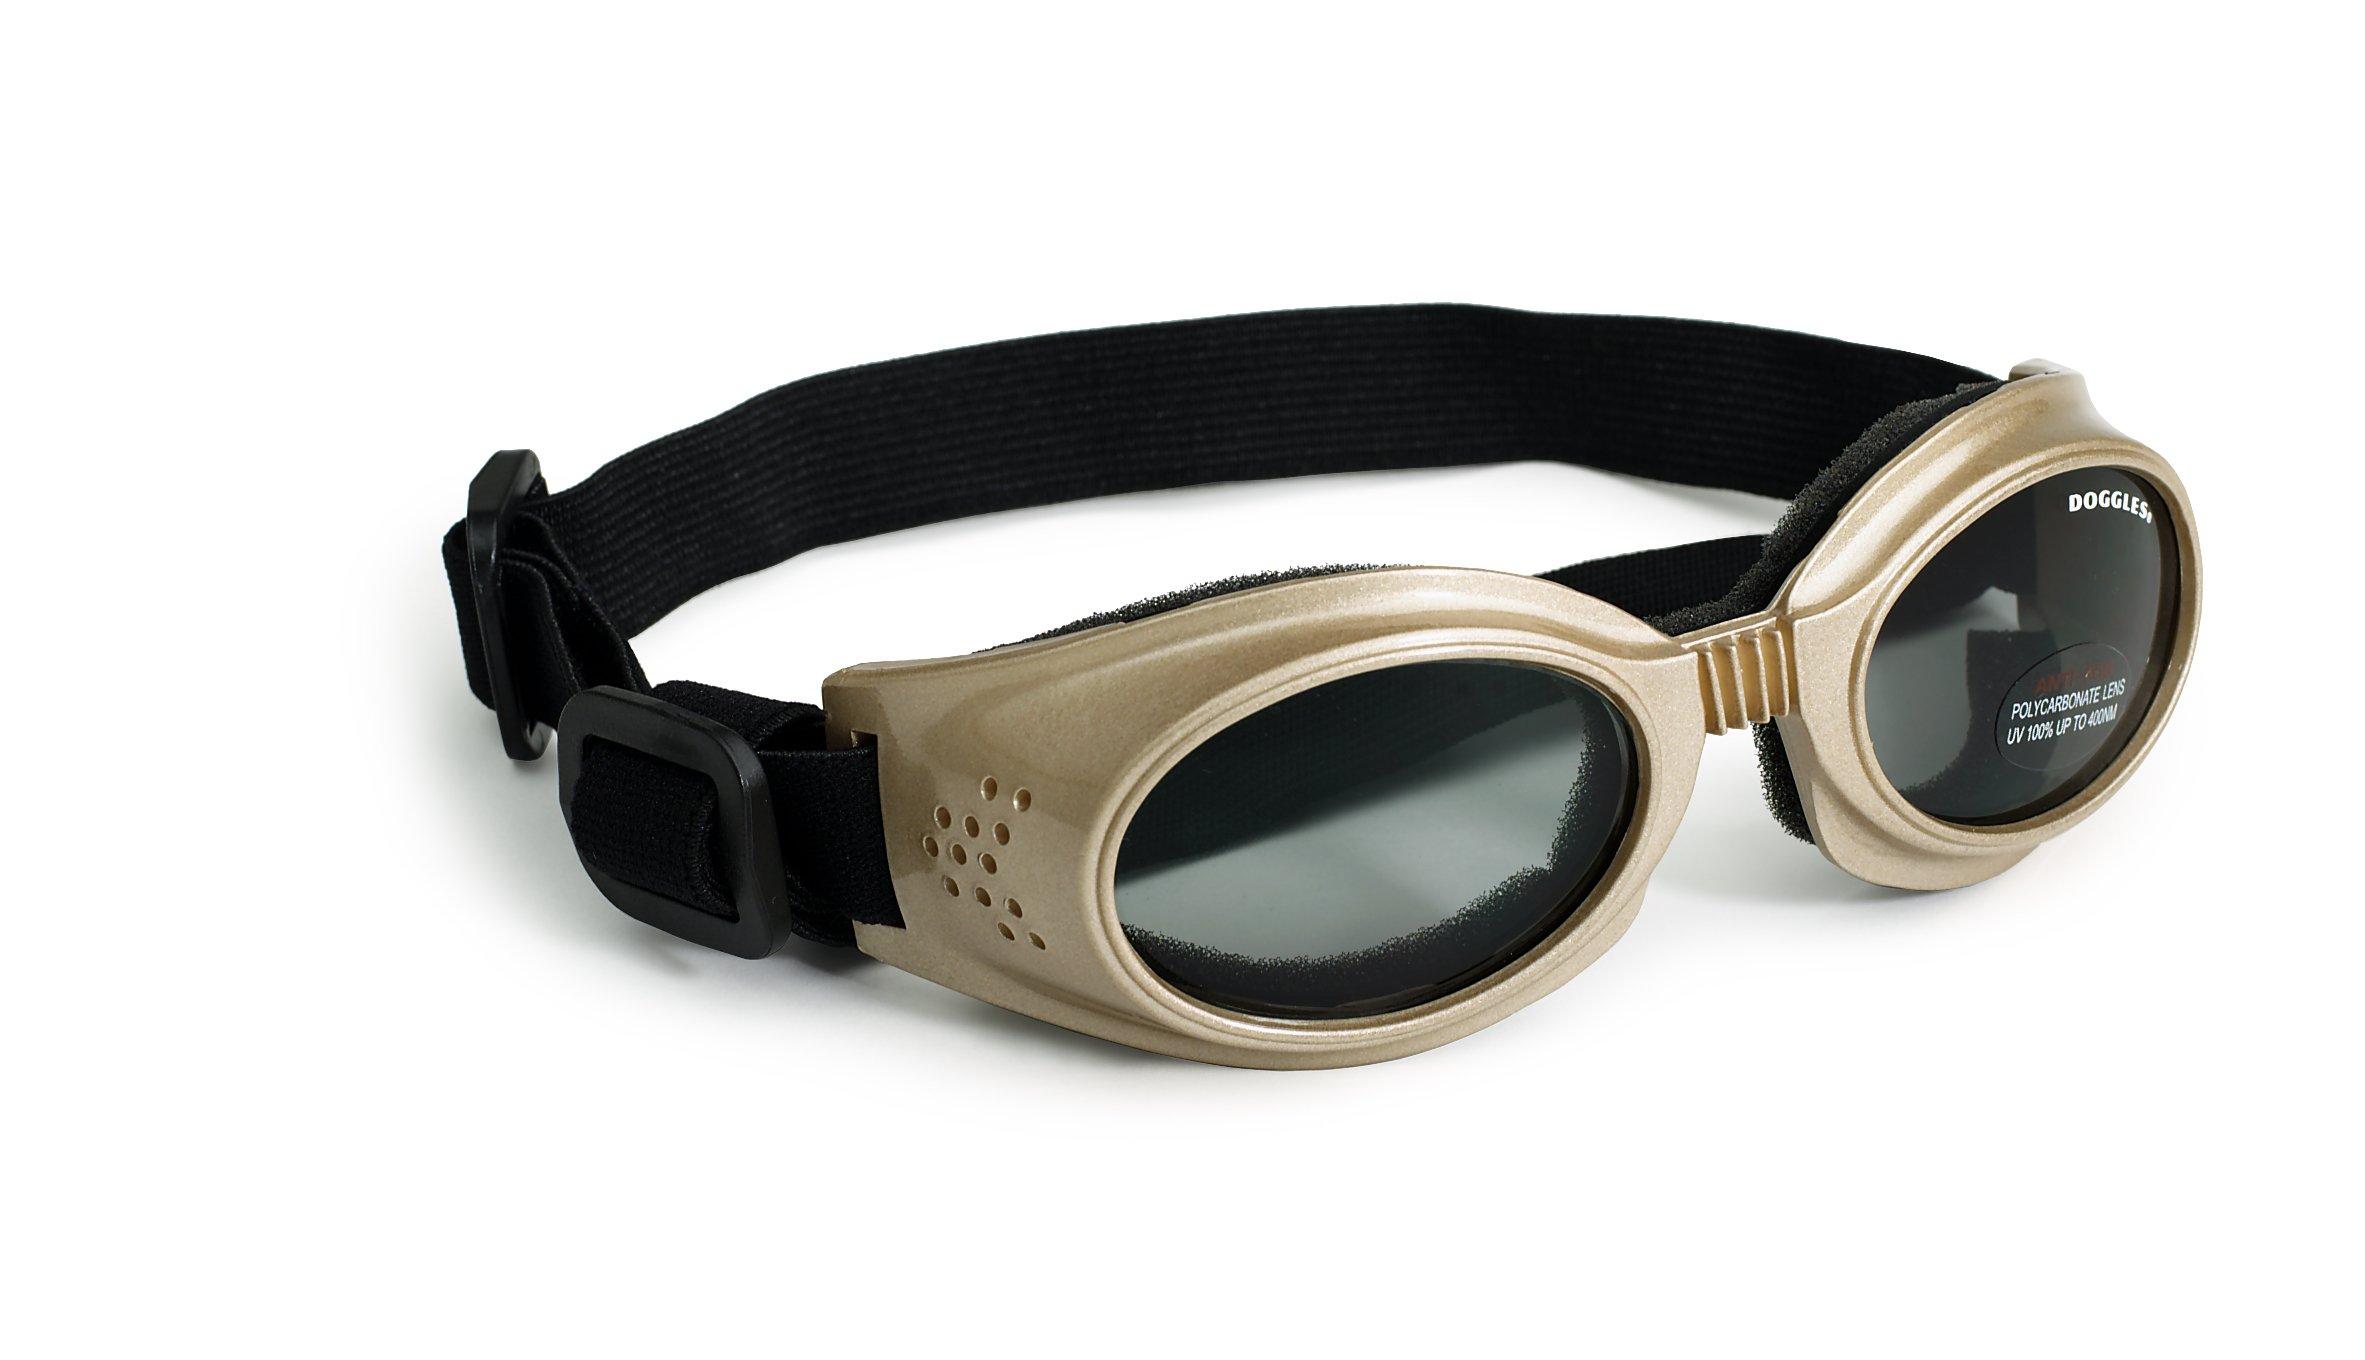 Doggles Originalz Small Frame Goggles for Dogs with Smoke Lens, Chrome